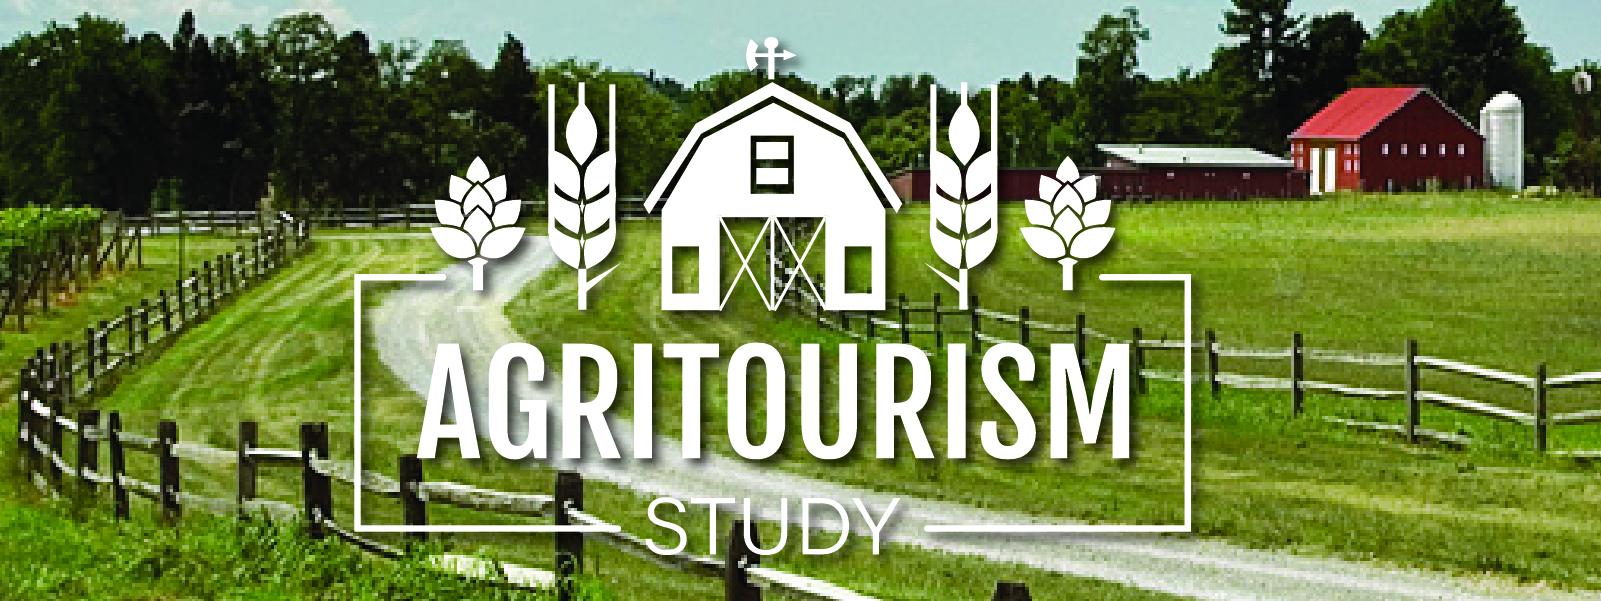 Agritourism Study